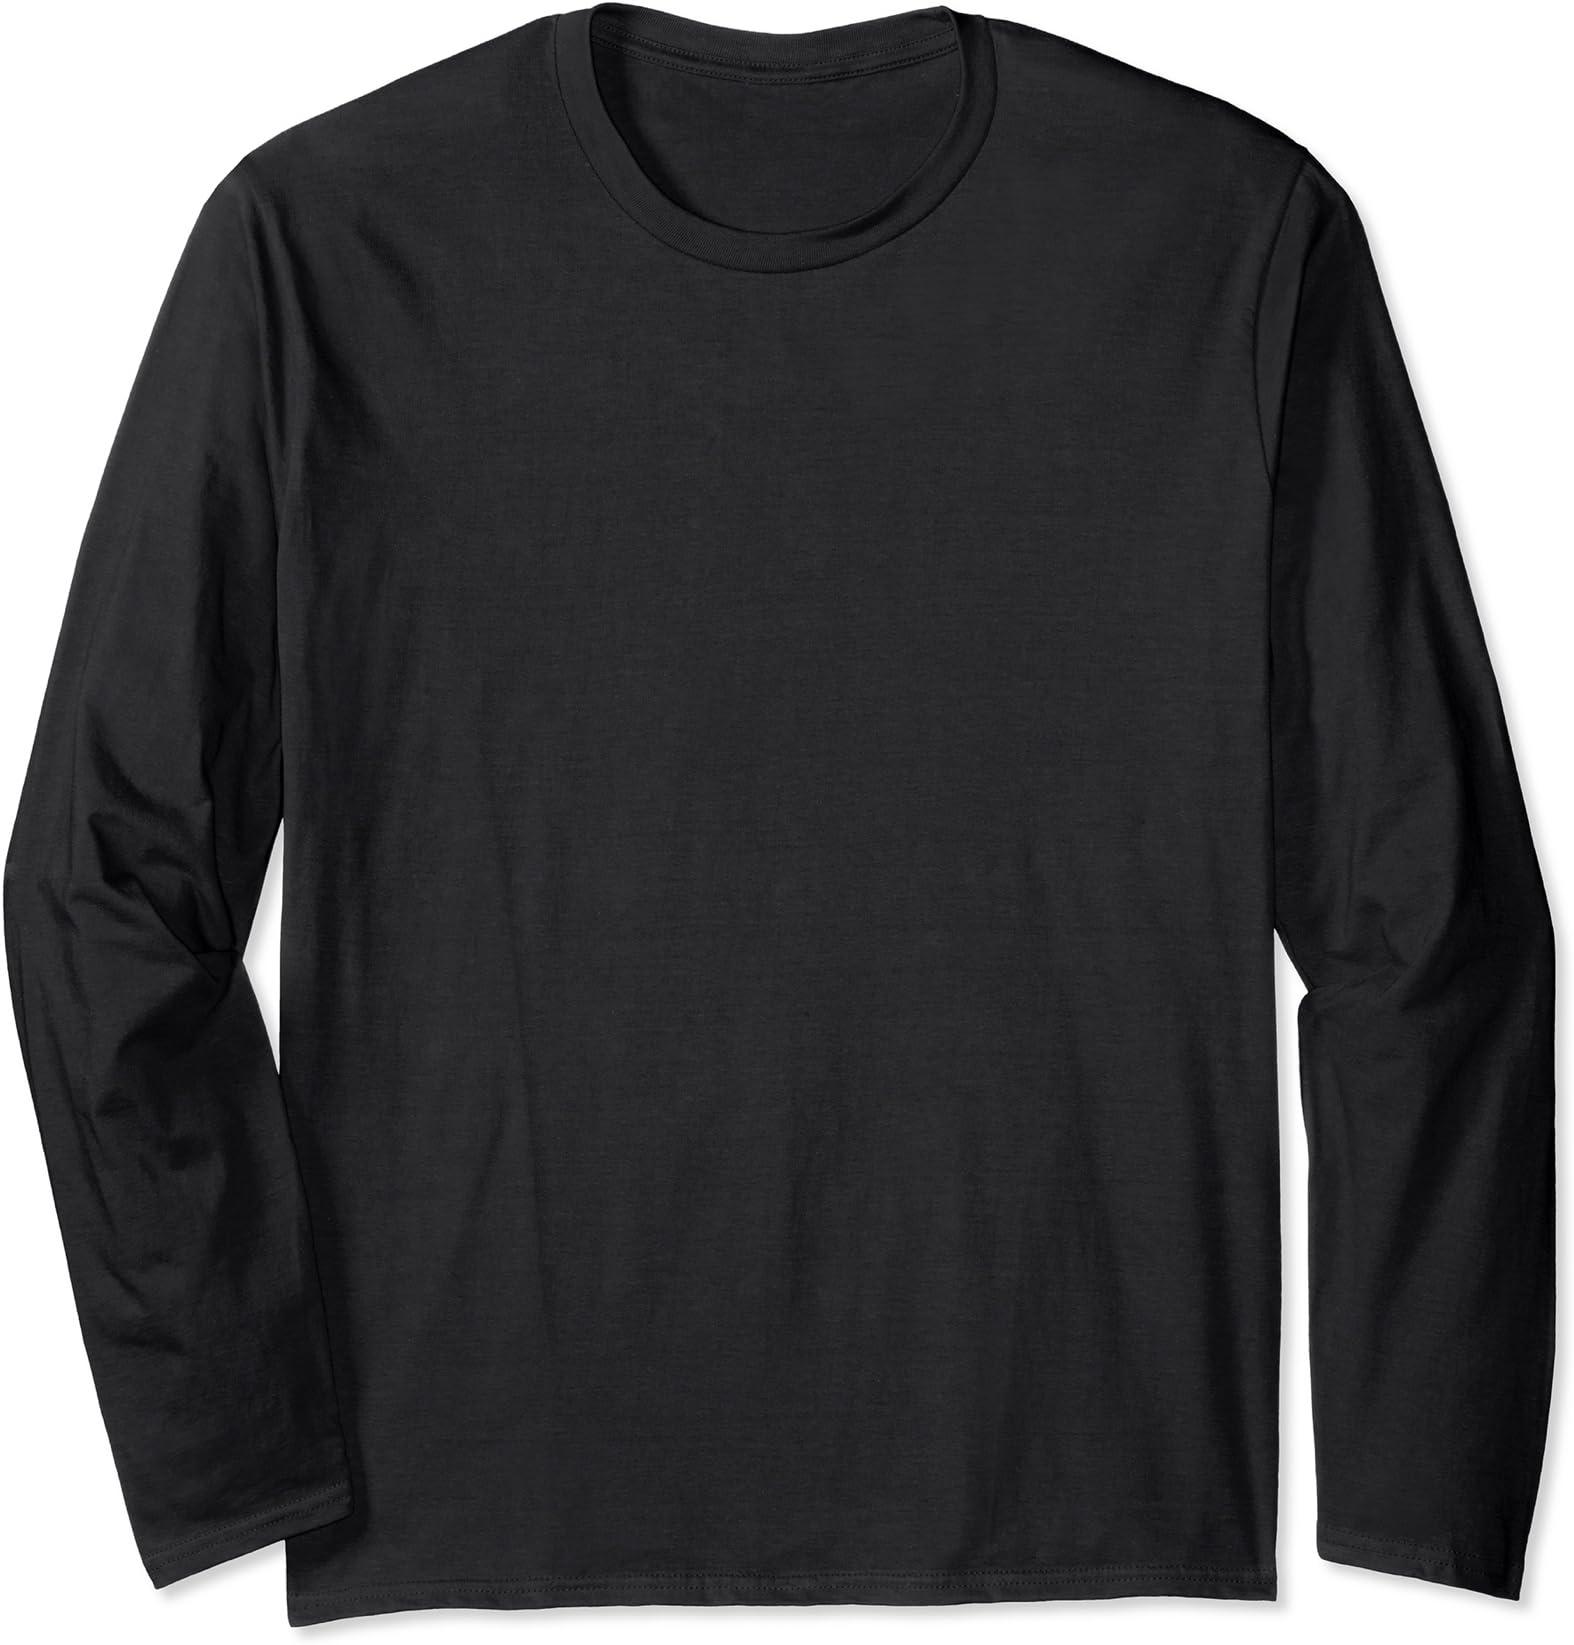 Denmark Outline Sweatshirt